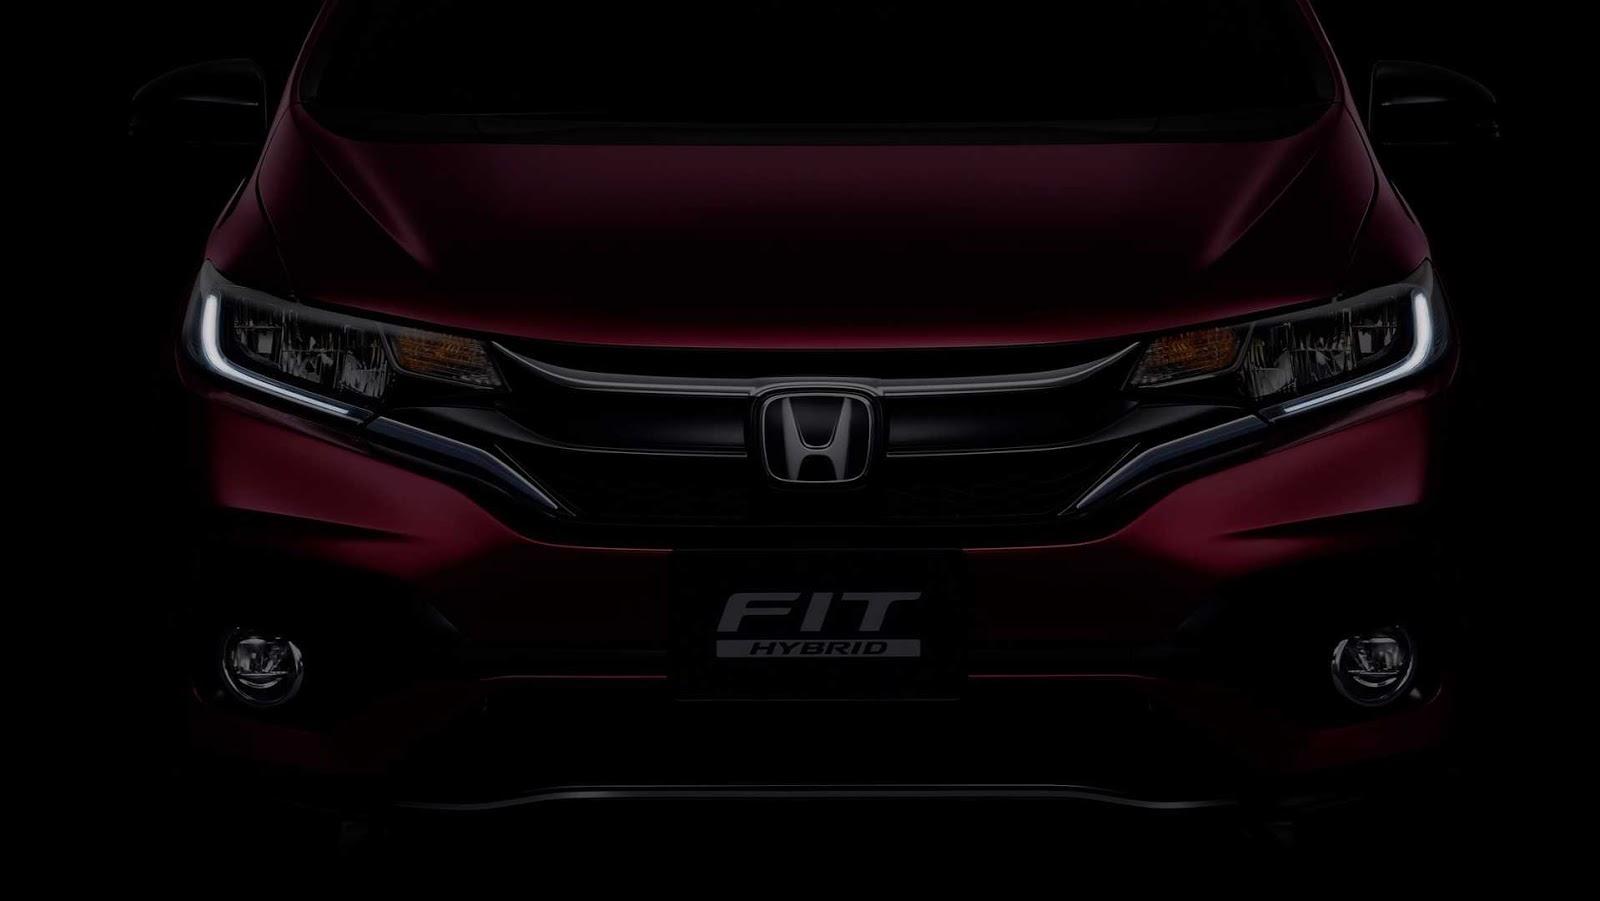 2018 Honda Fit Jazz Reveals Itself On Japanese Website Carscoops